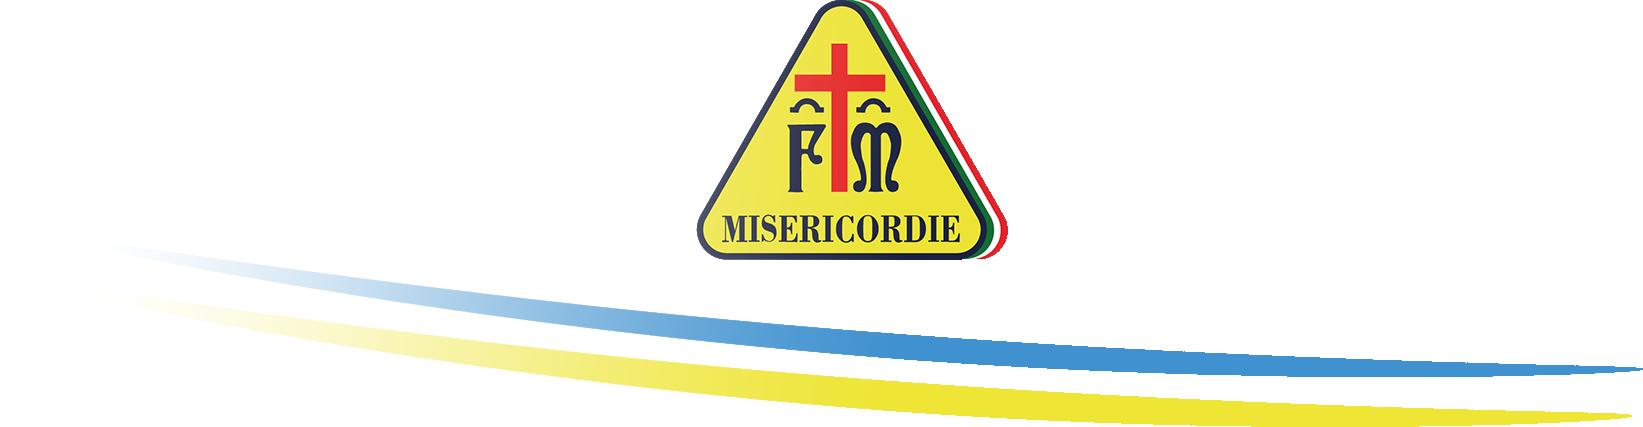 logo-mise-sito3